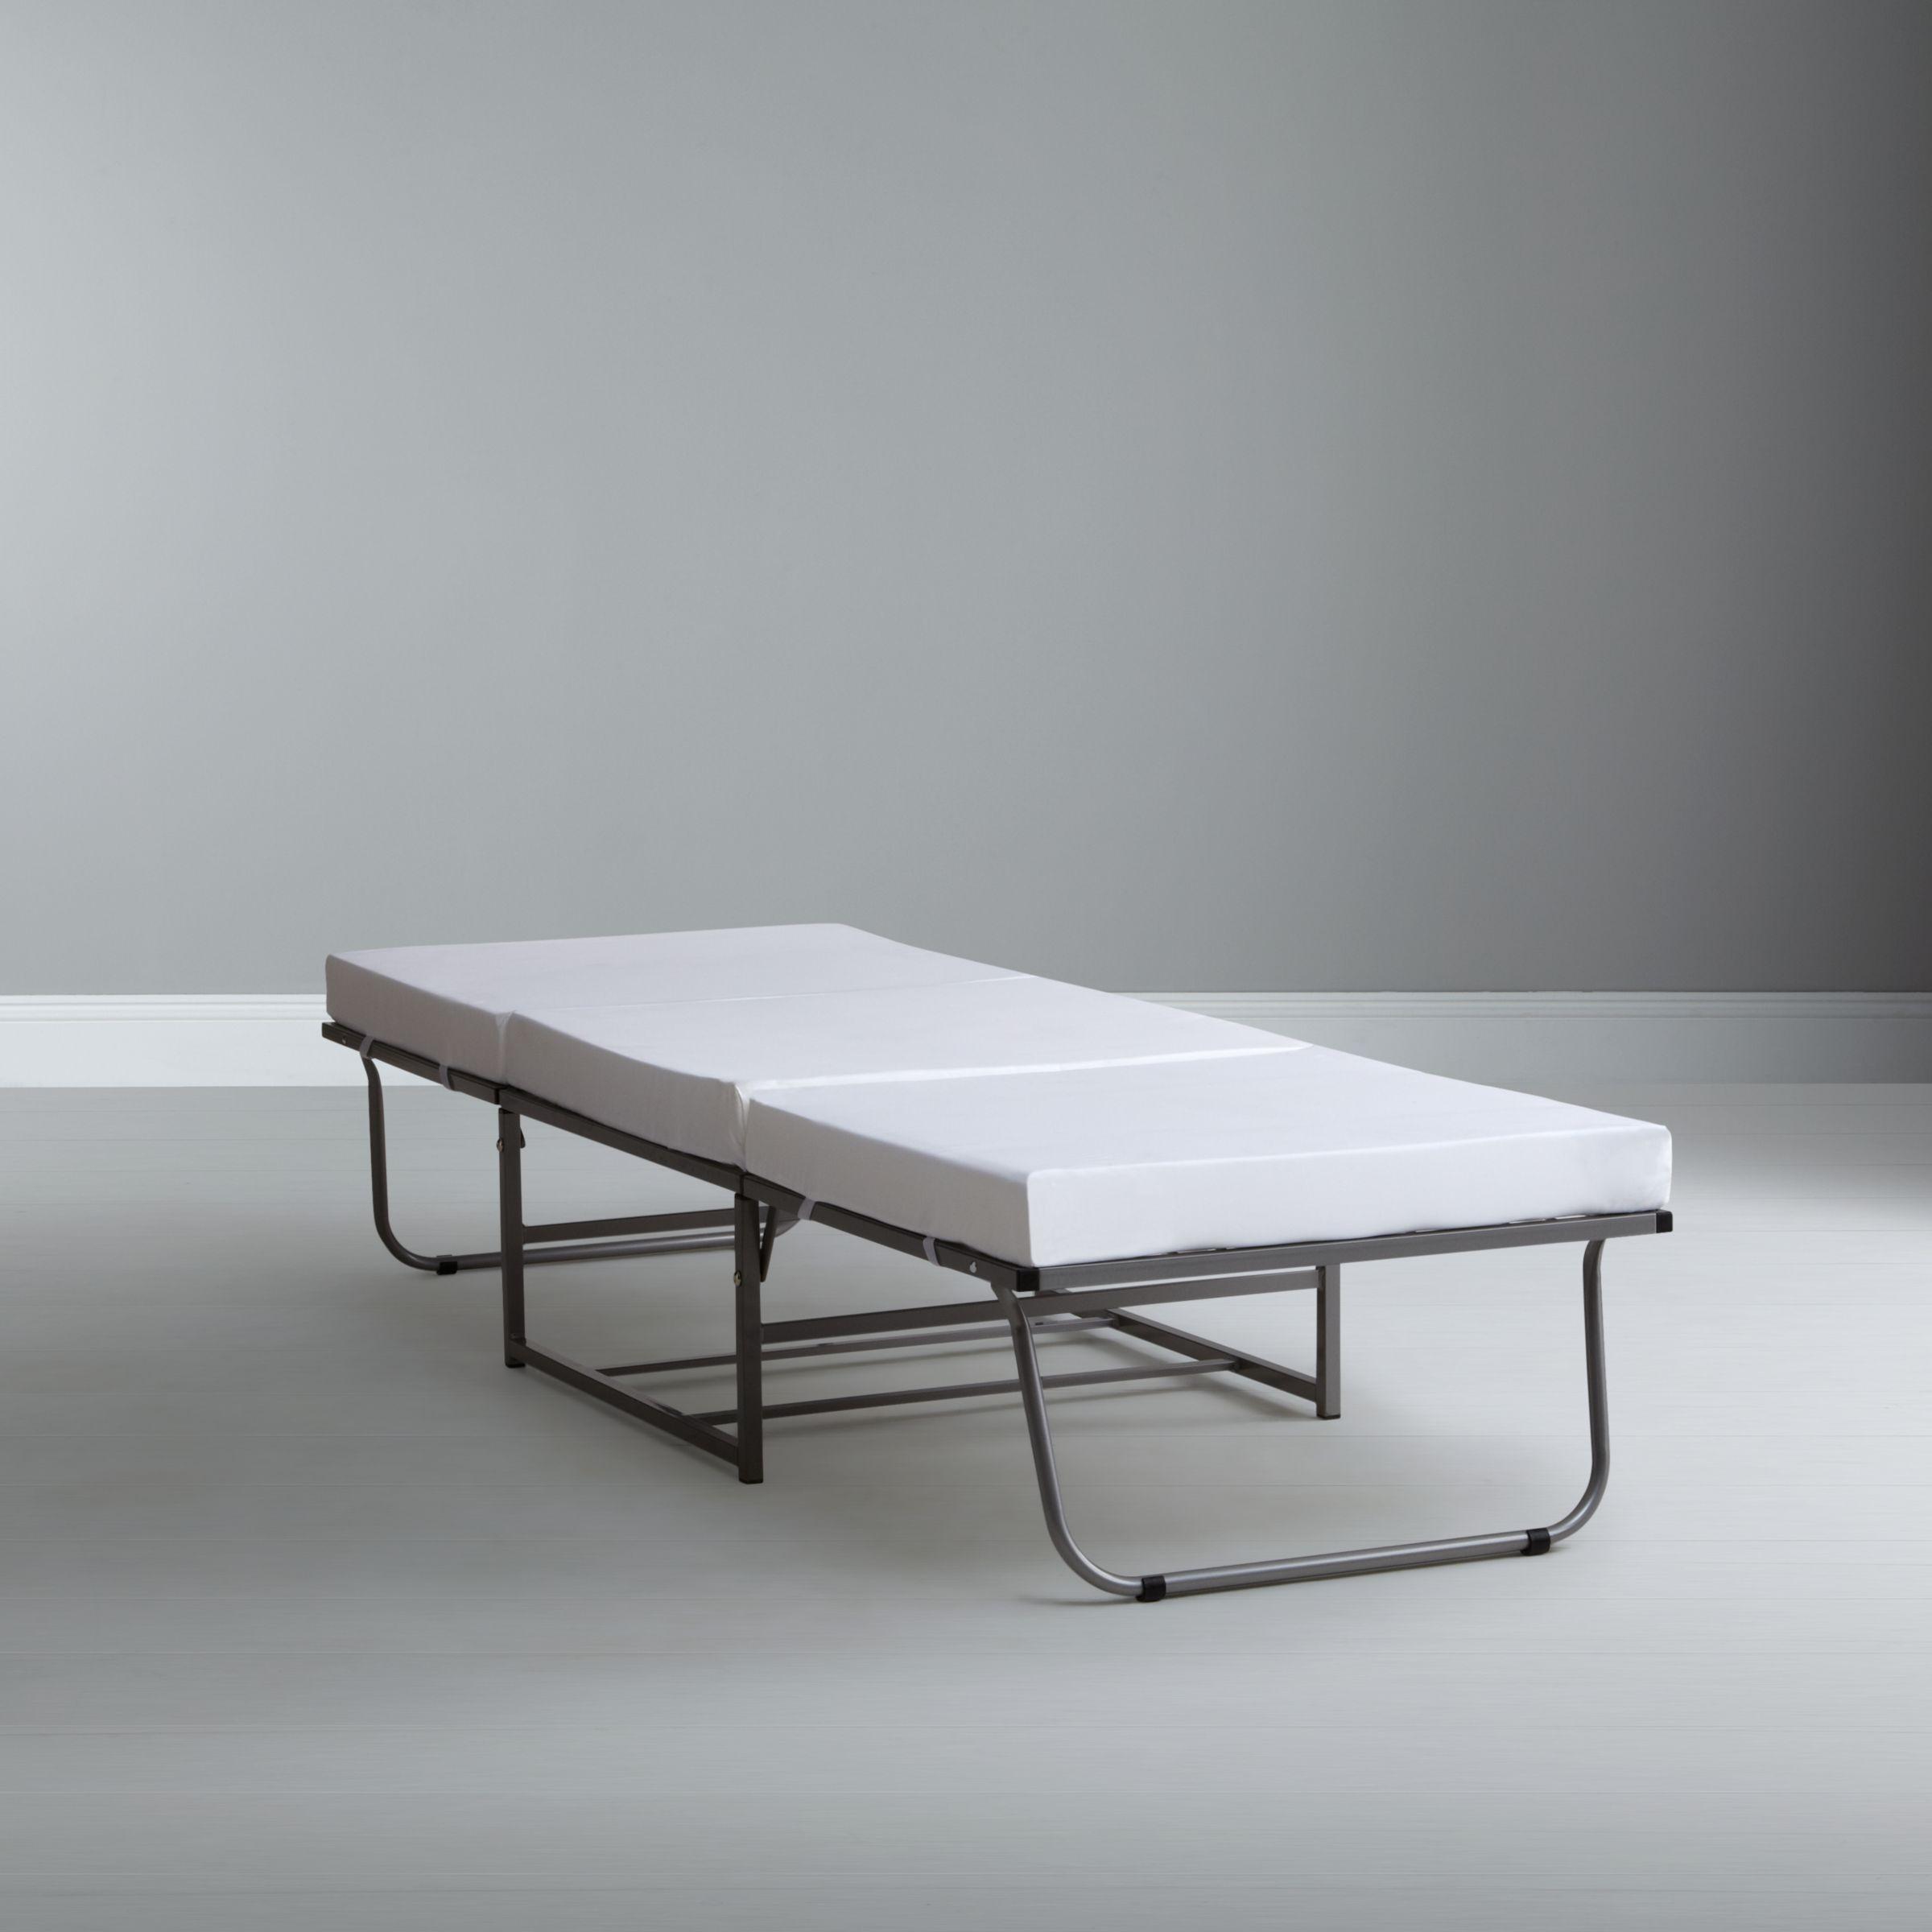 Zig Zag Folding Guest Bed, Single